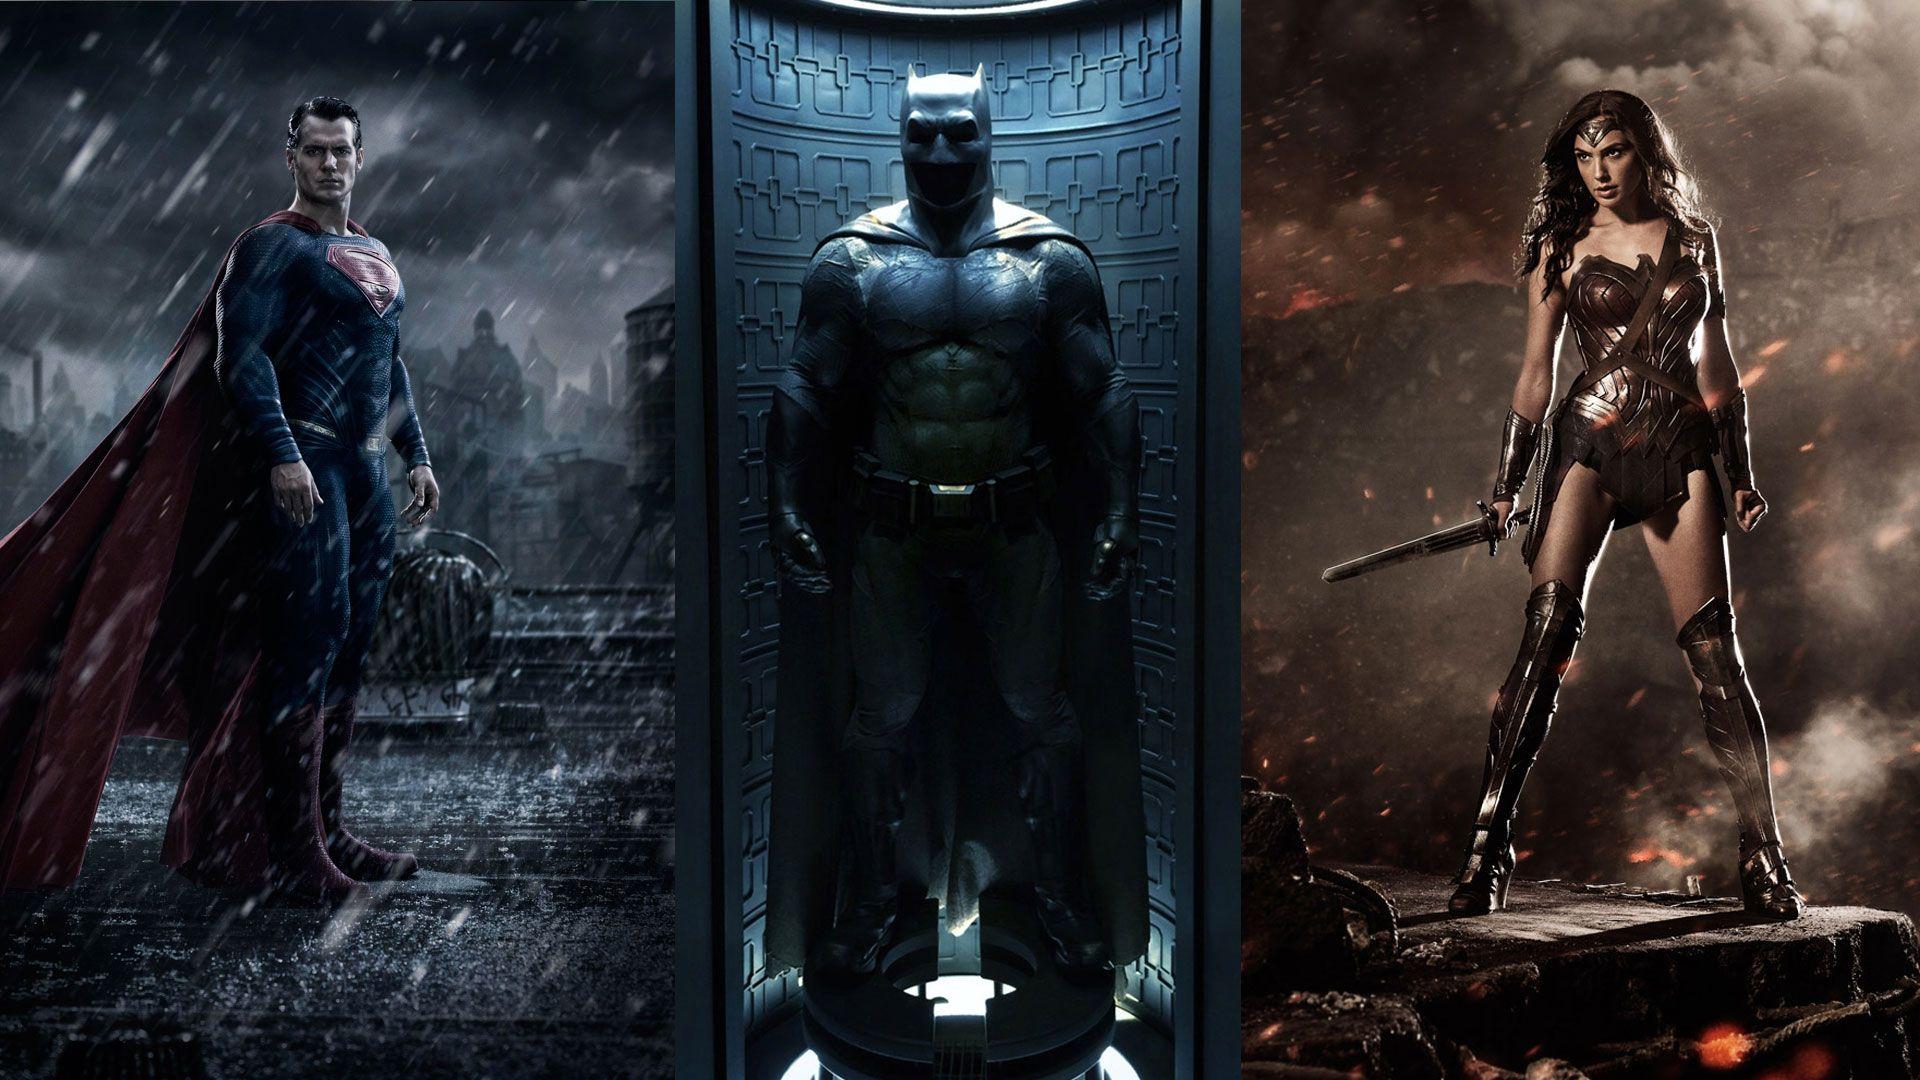 Batman Vs Superman Dawn Of Justice Movie Wallpaper Movies HD 750x1334 Wallpapers 48